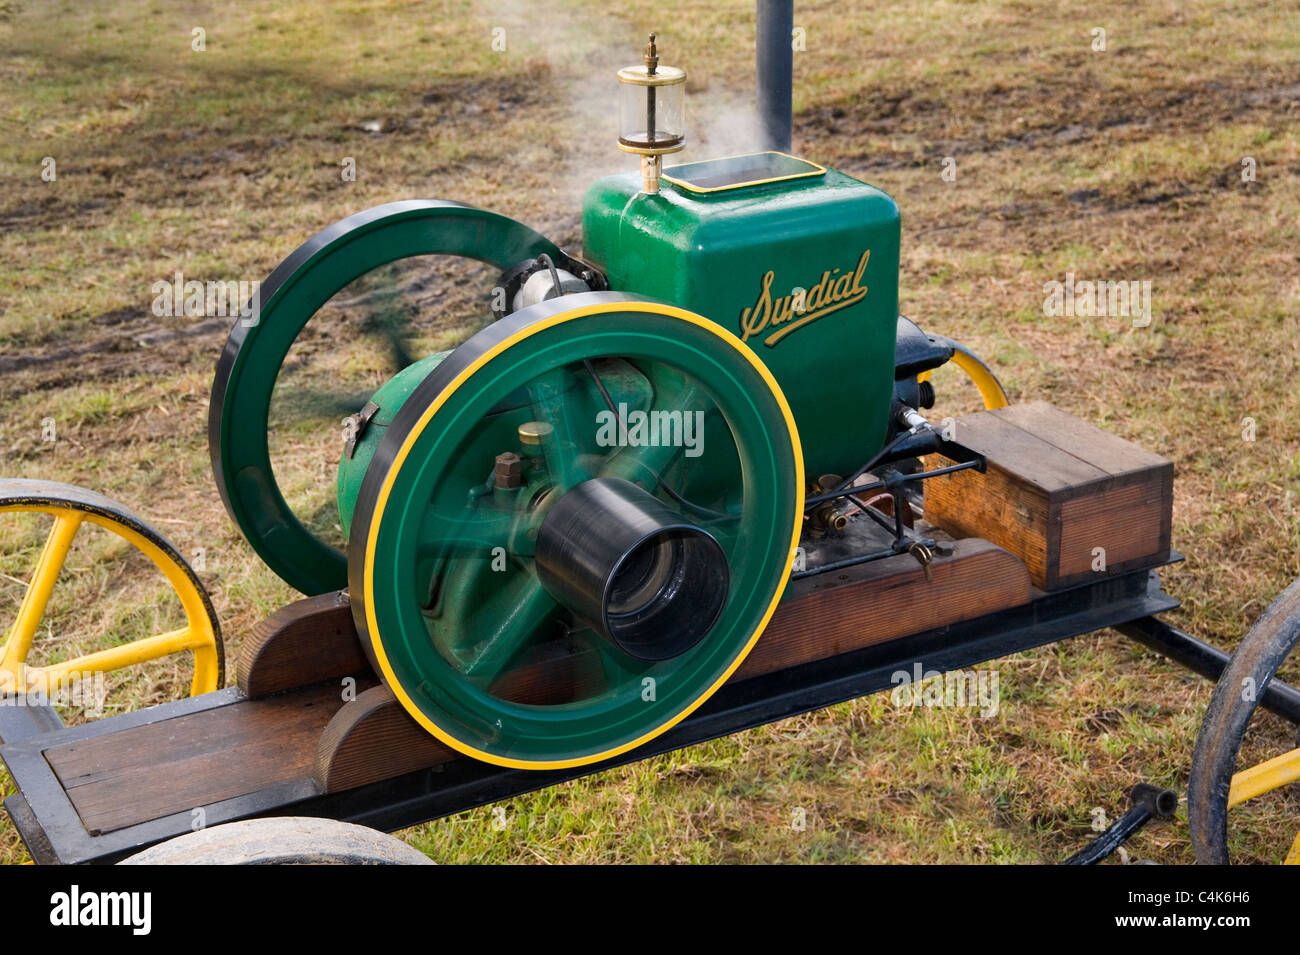 sundial stationary petrol engine power powered - Stock Image